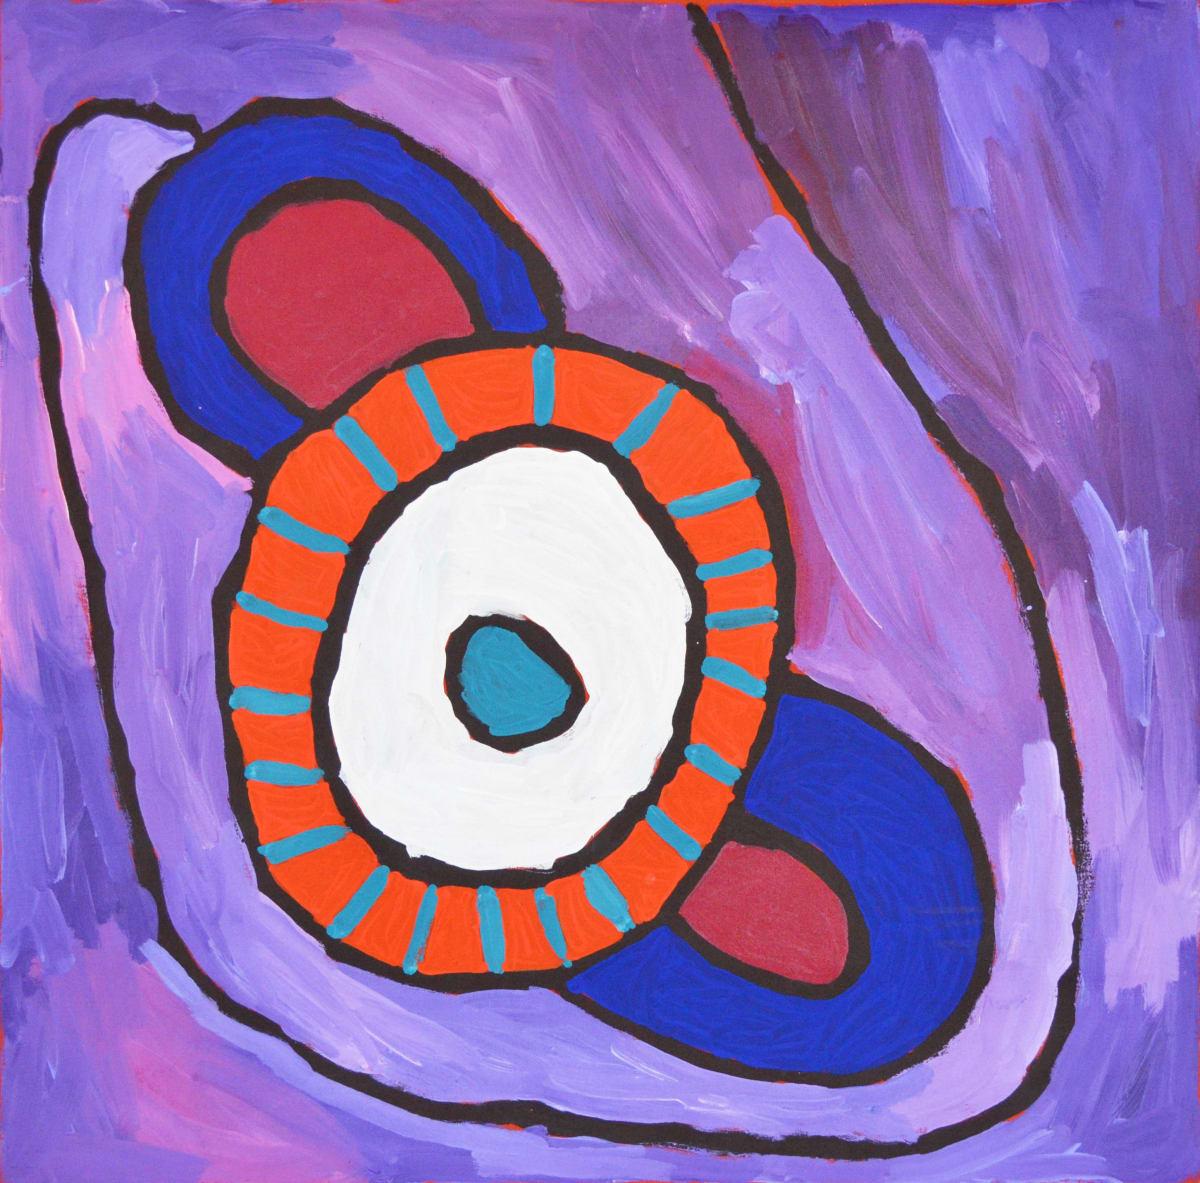 Linda Puna Antara -Maku Dreaming acrylic on linen 96 x 96 cm